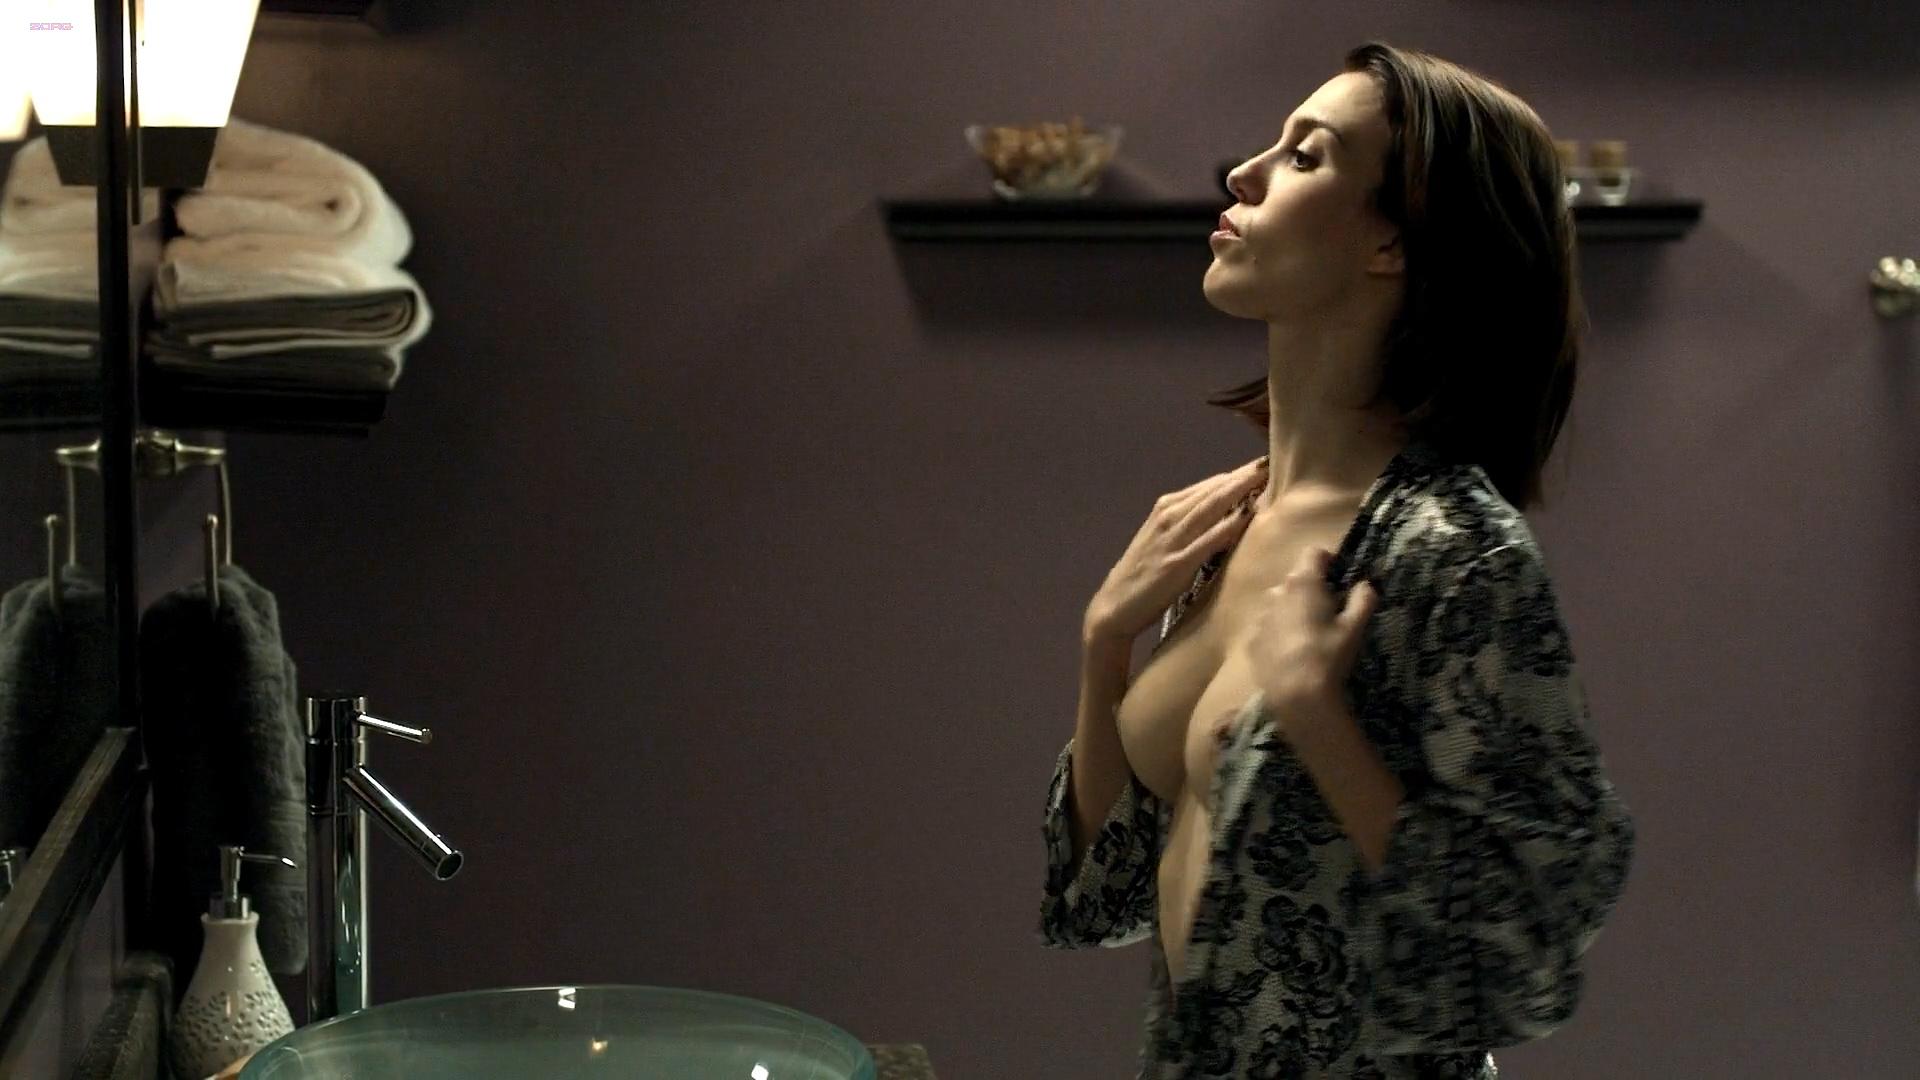 Von carlson romano nude christy pics